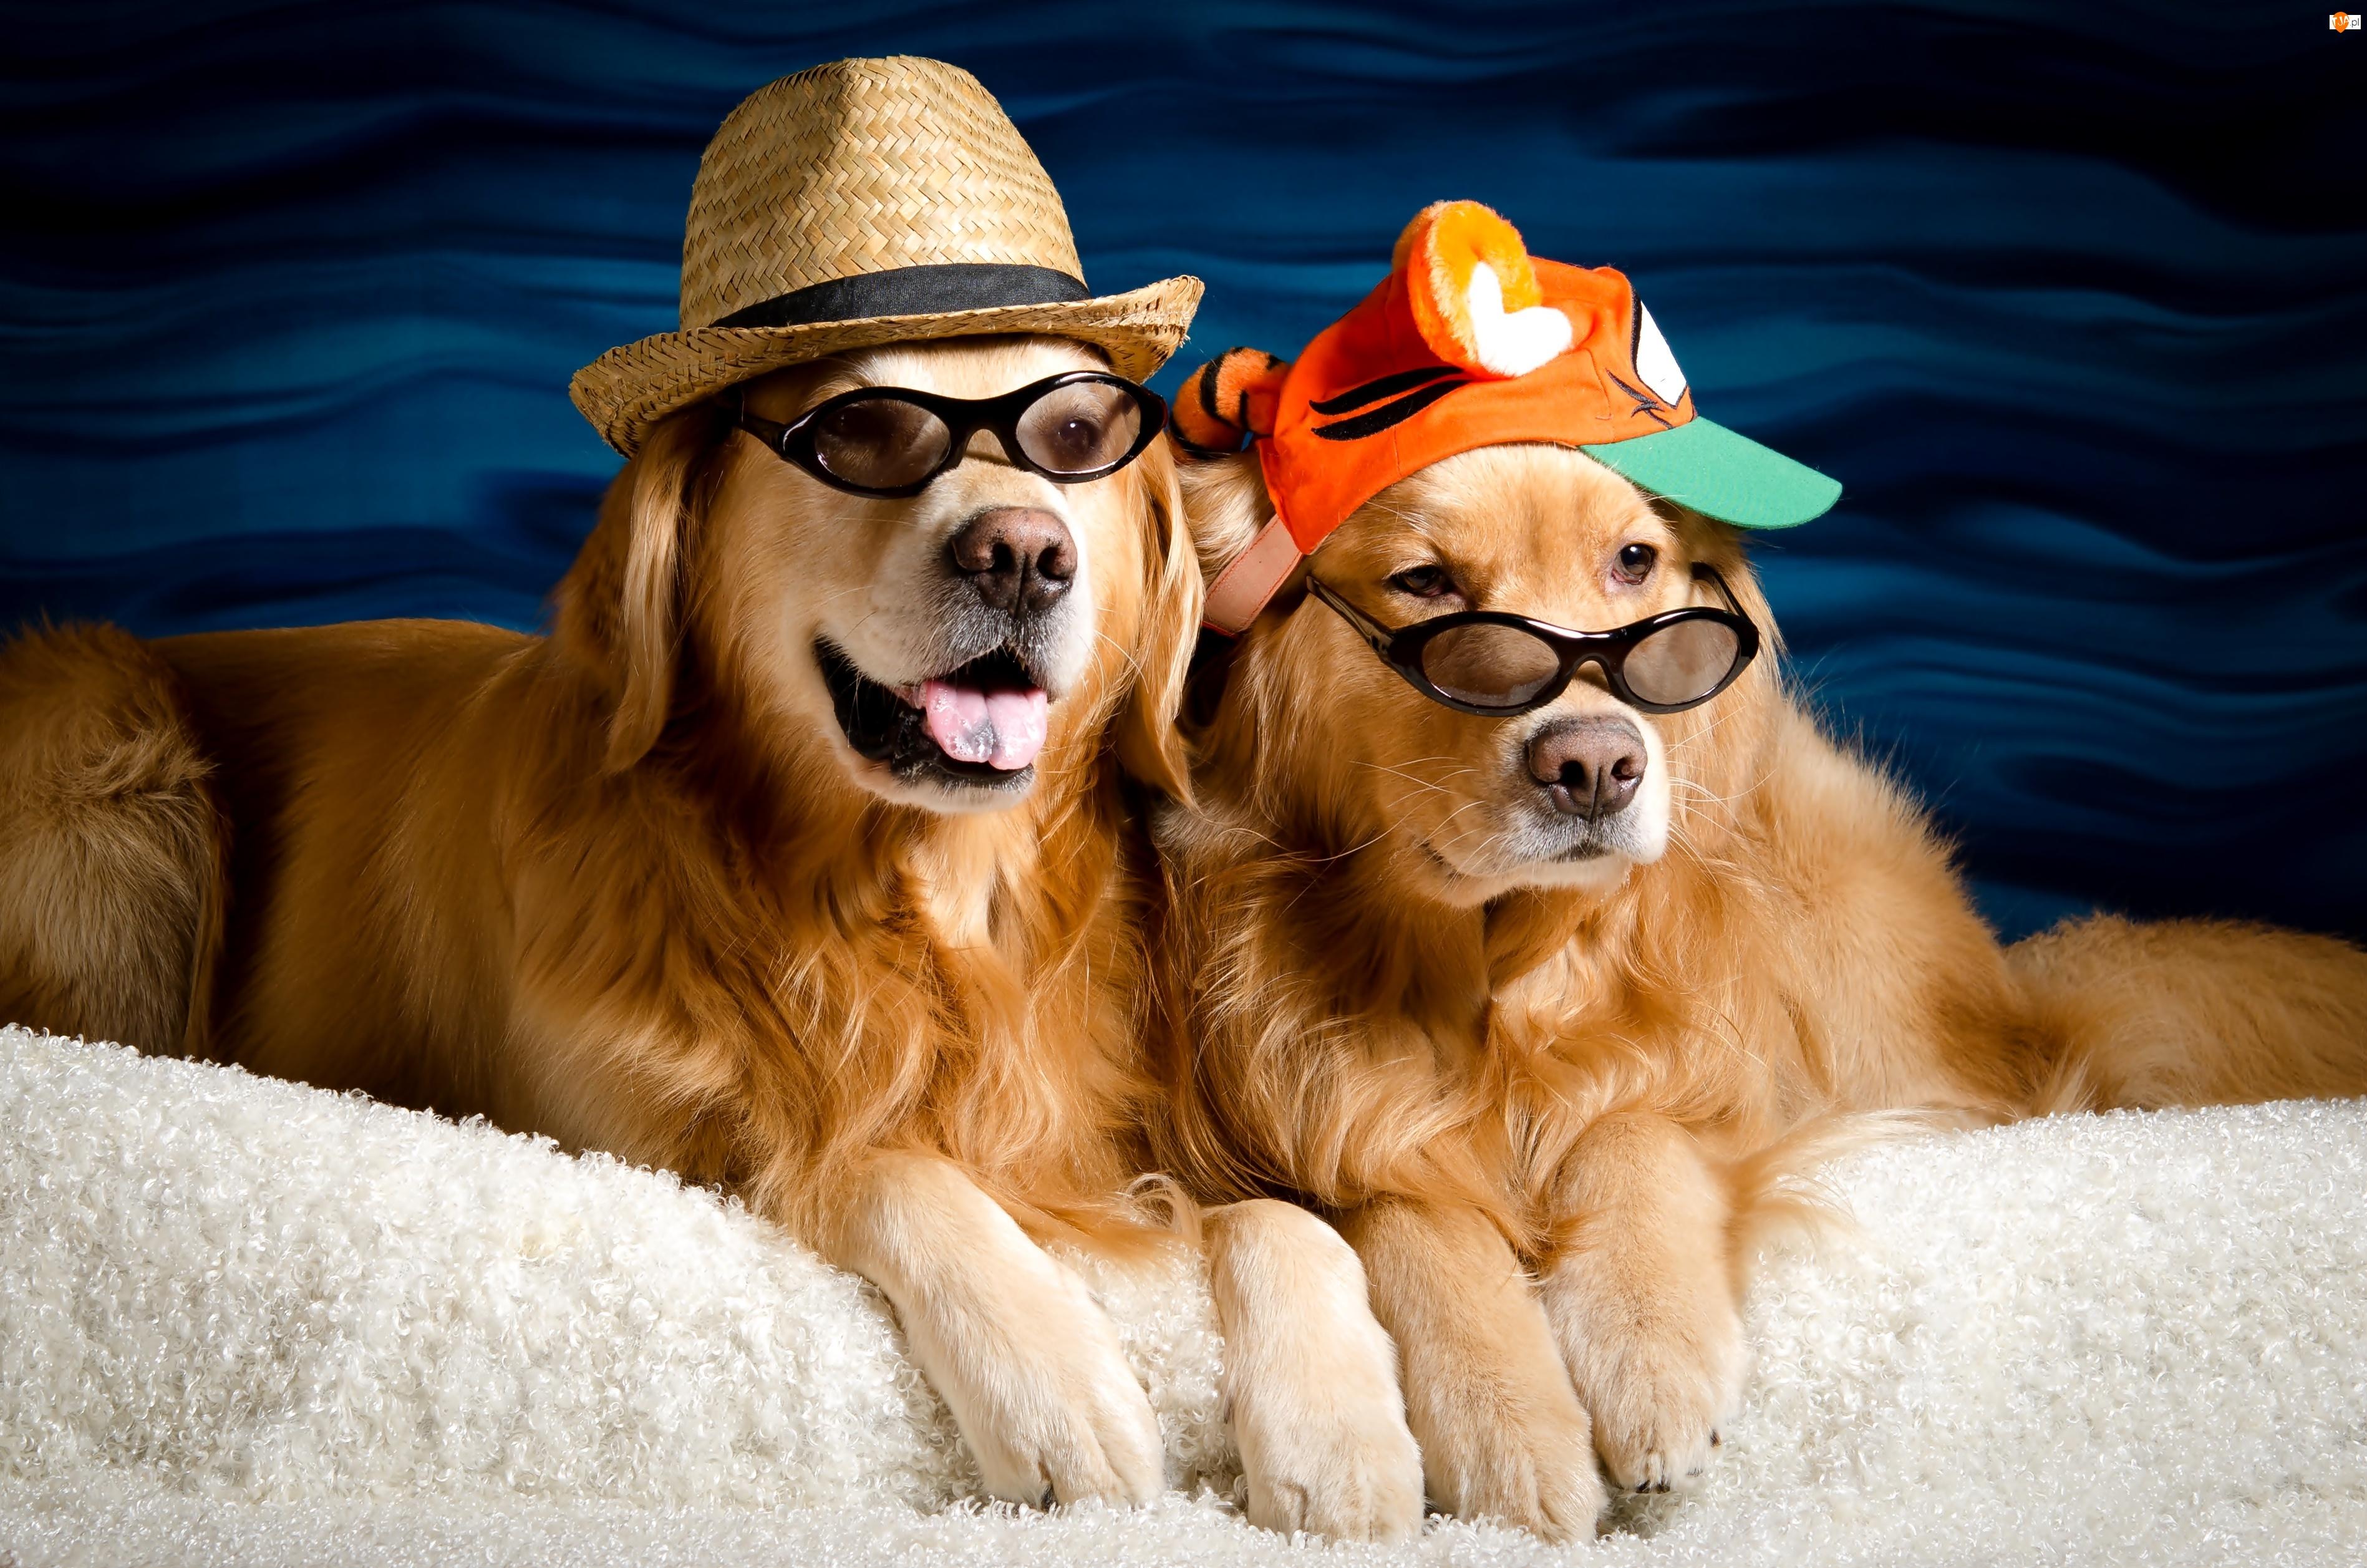 Psy, Dwa, Kapelusz, Okulary, Golden, Czapka